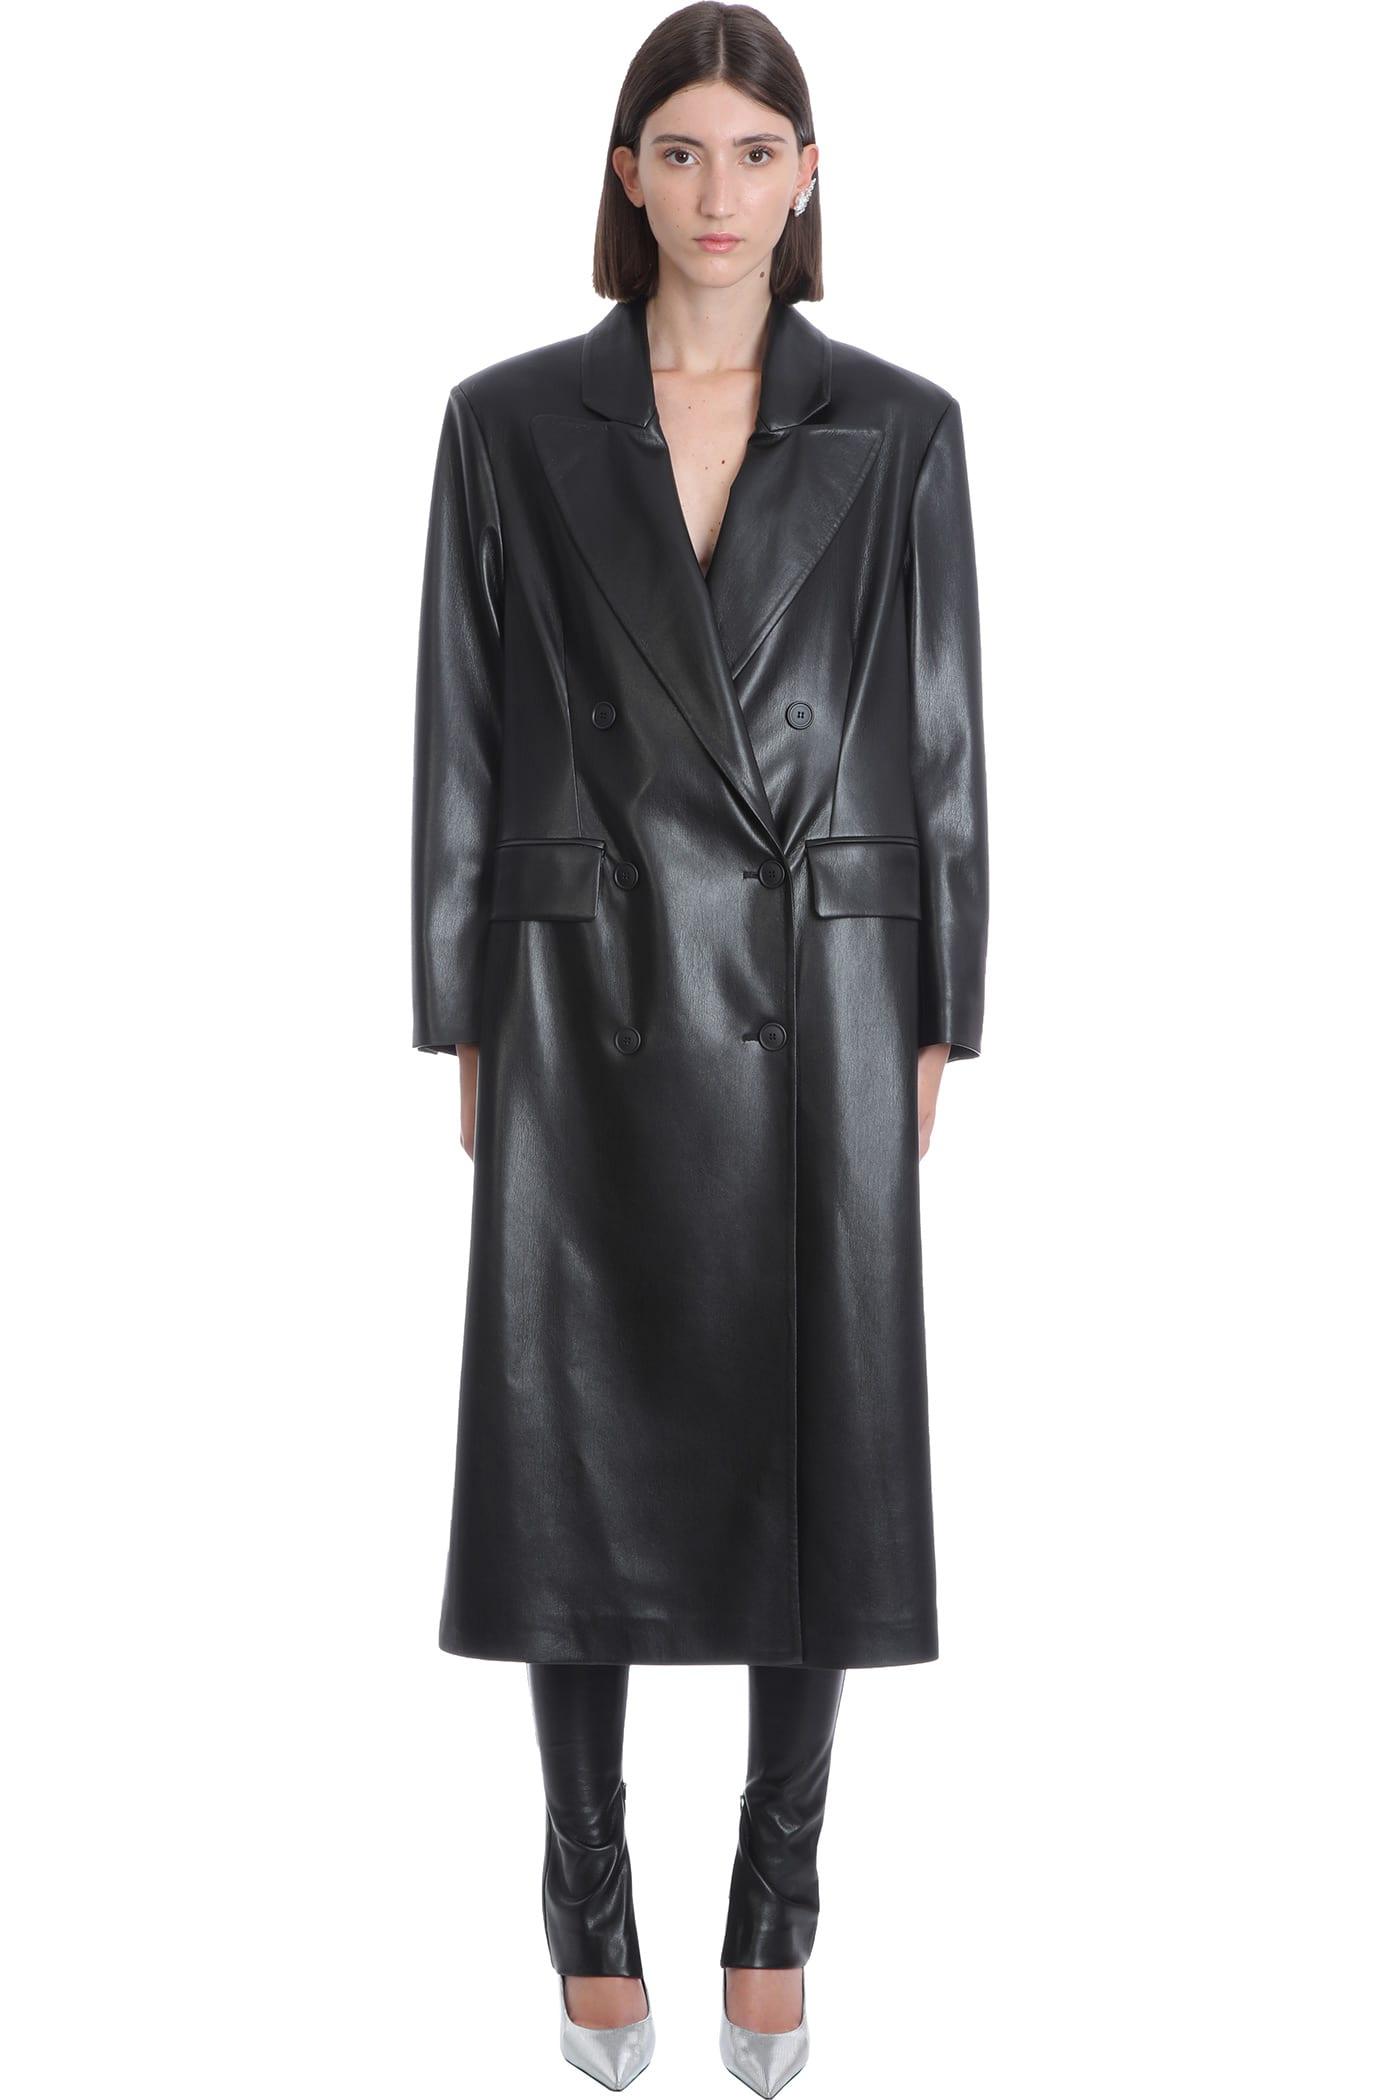 Halston Coat In Black Polyamide